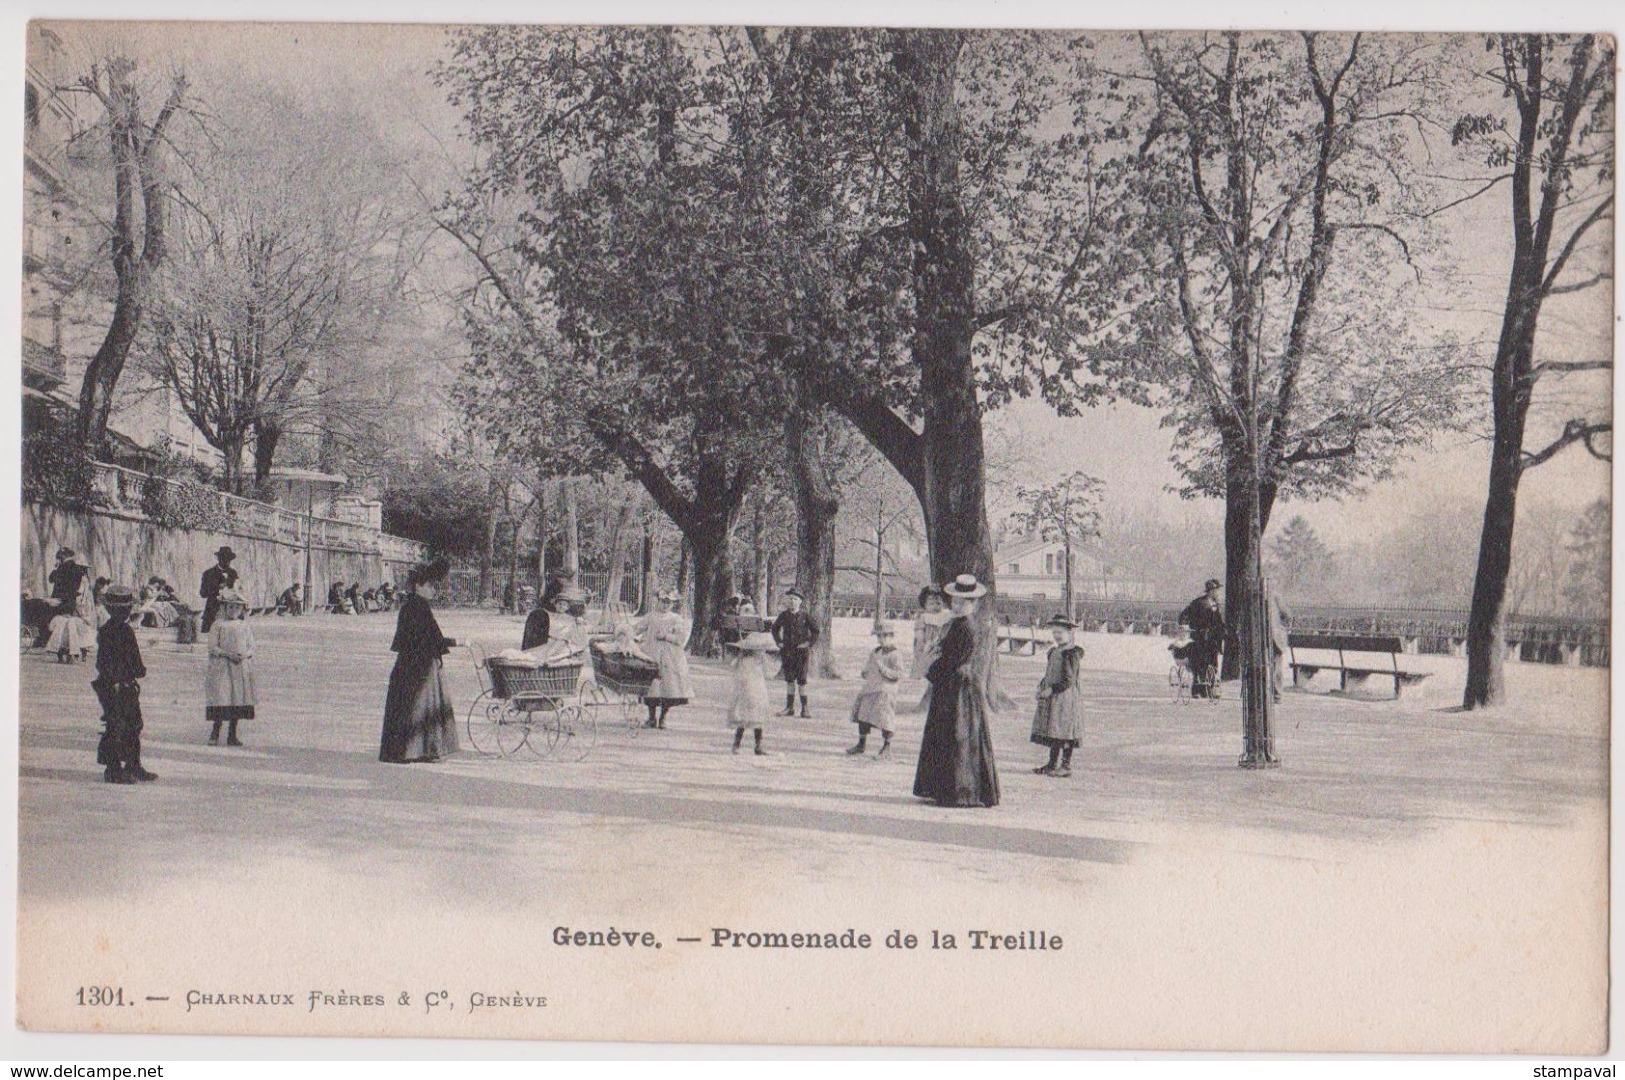 GENEVE - PROMENADE DE LA TREILLE - N° 1301 - GE Ginevra